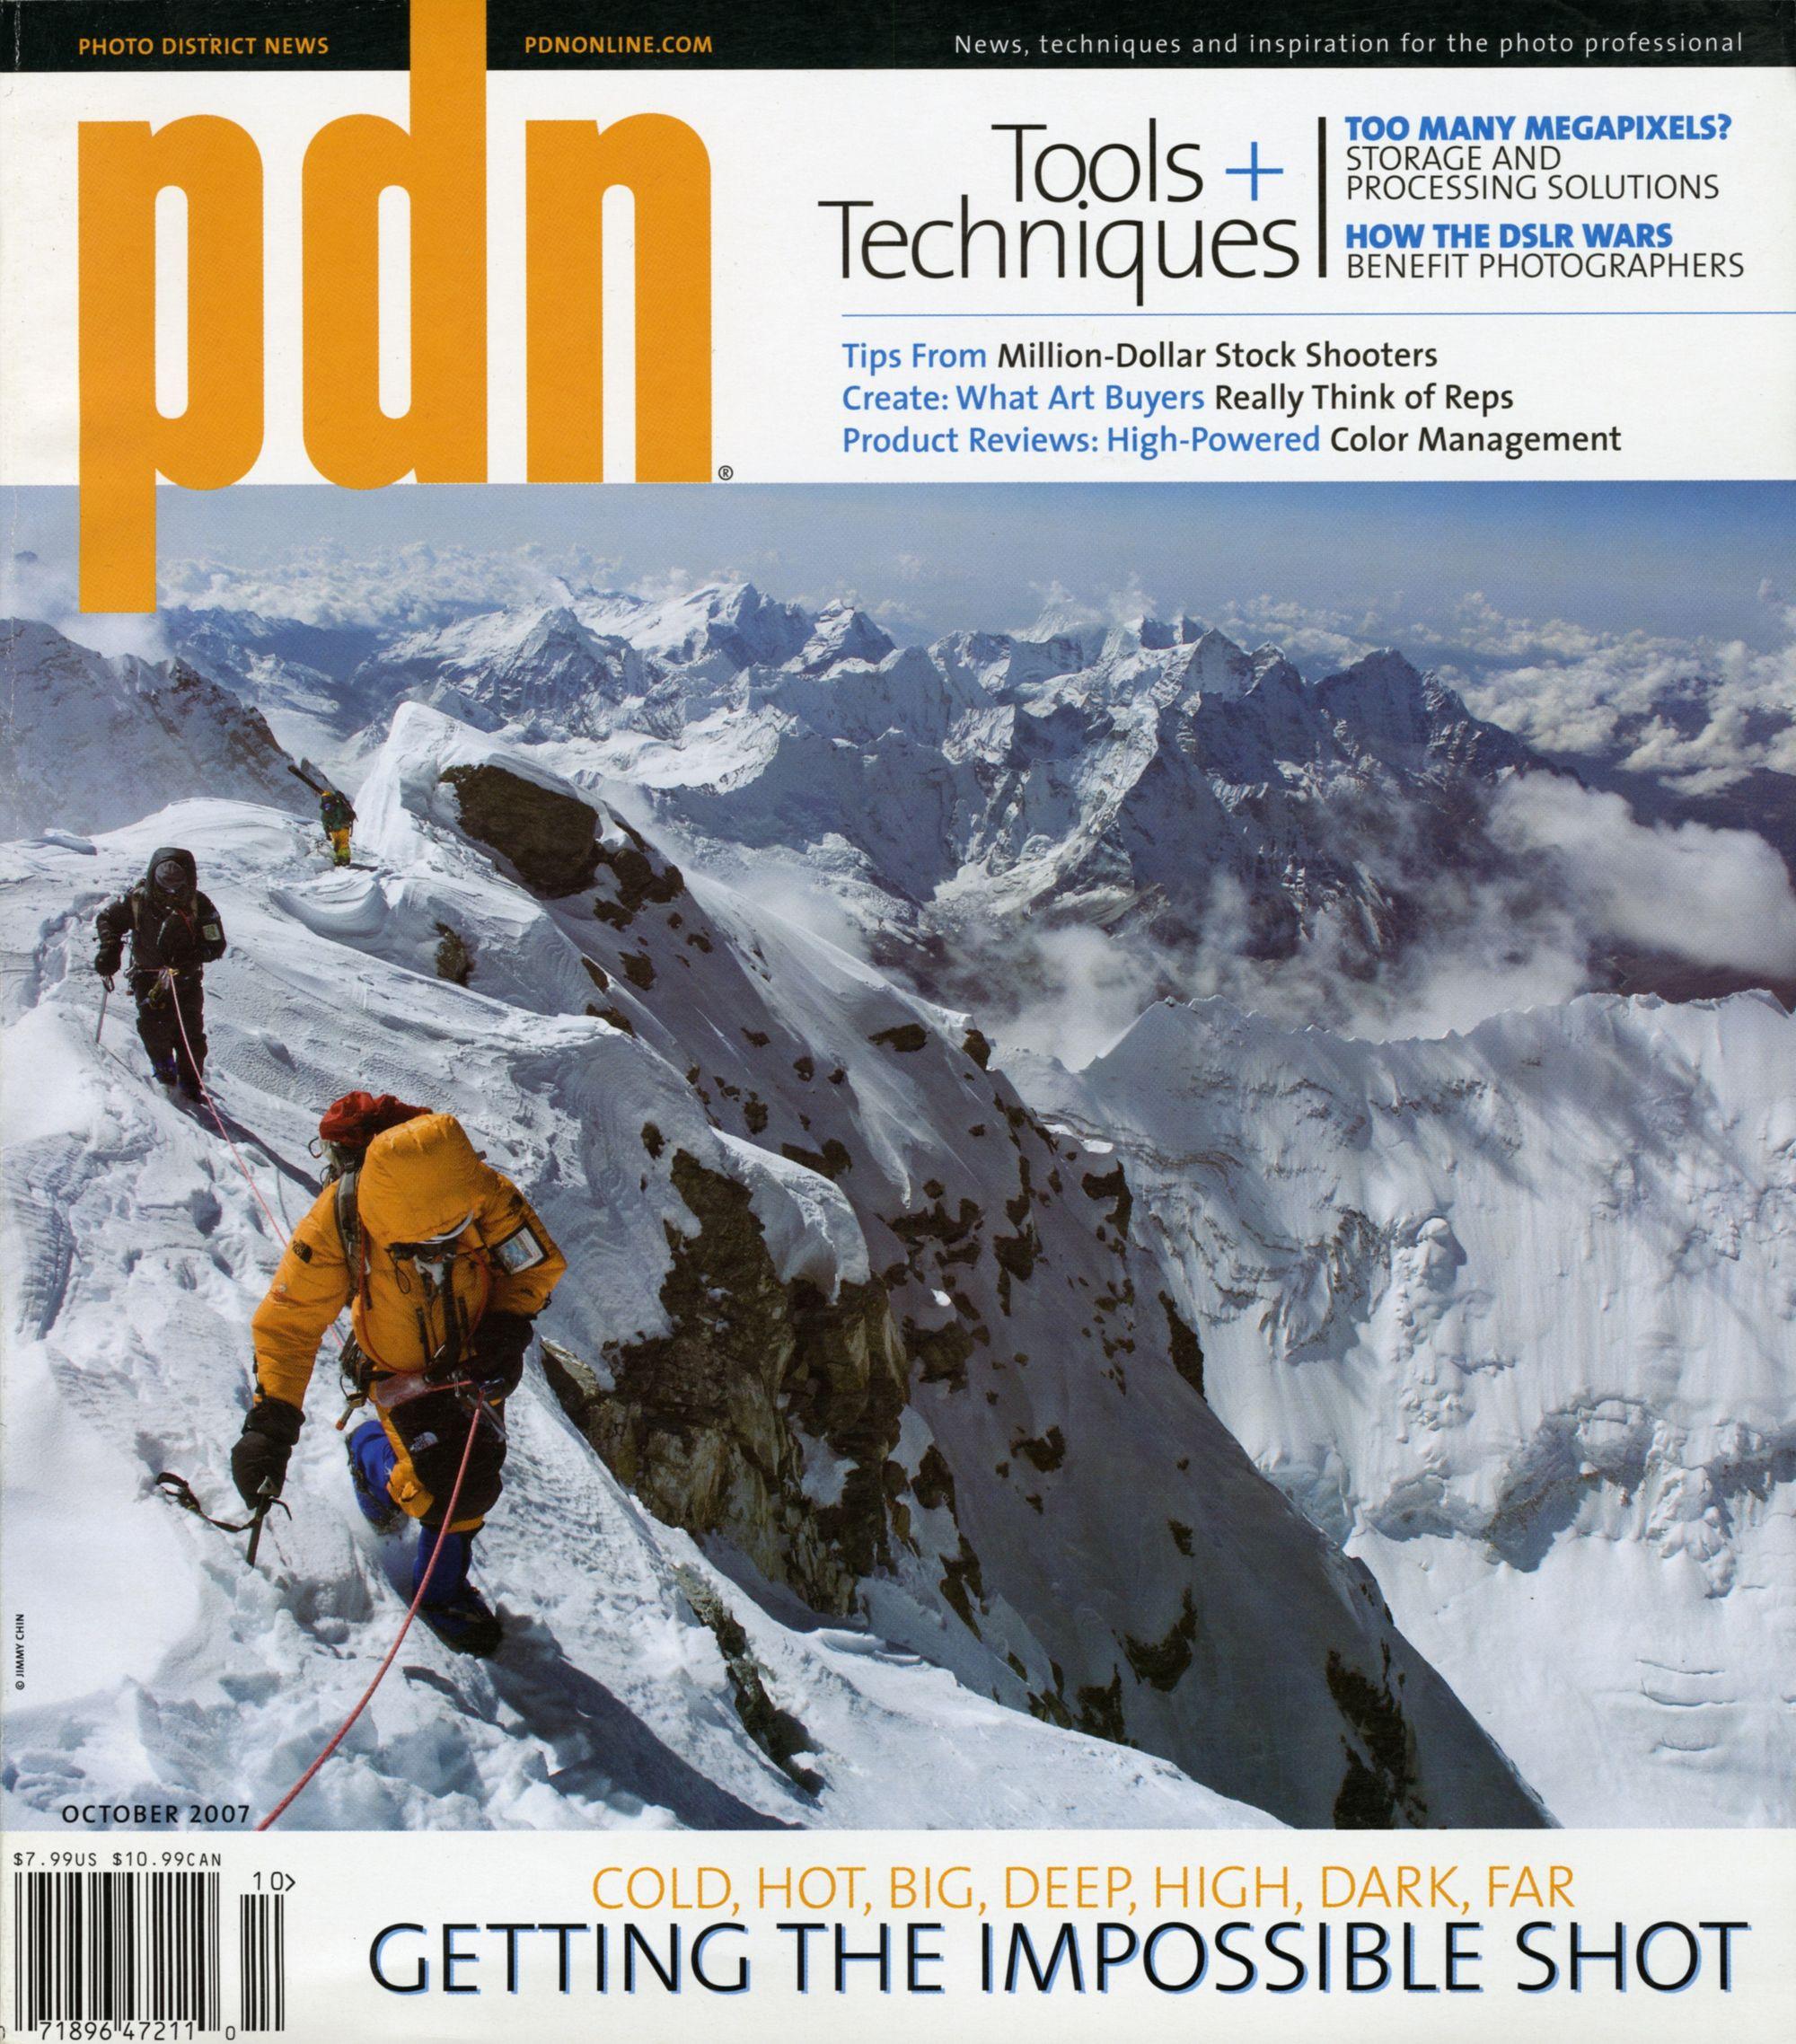 OCTOBER 2007 COVER.jpg